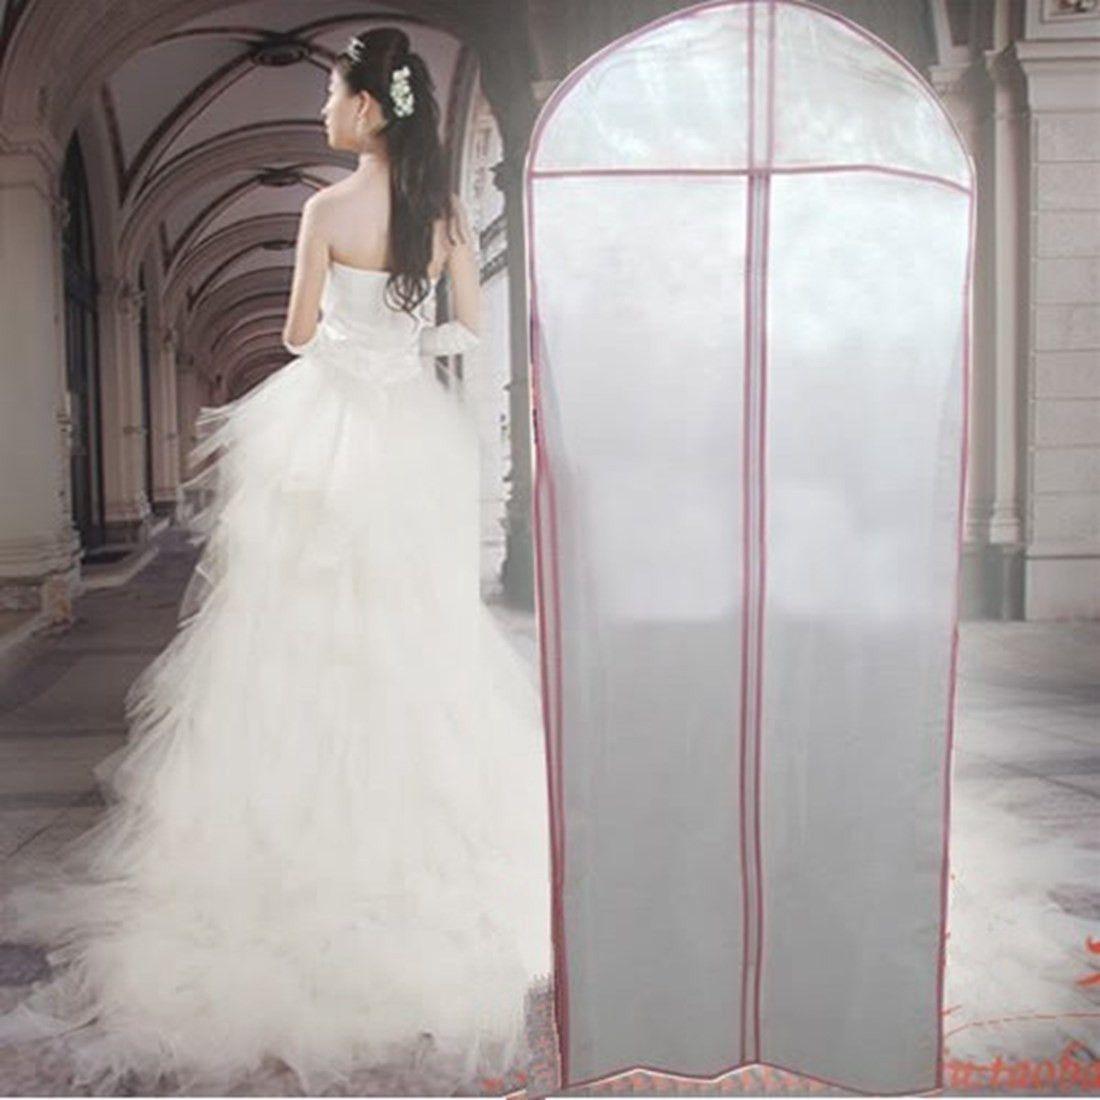 Bridal Wedding Dress Storage Bag Gown Garment Bag | Products ...